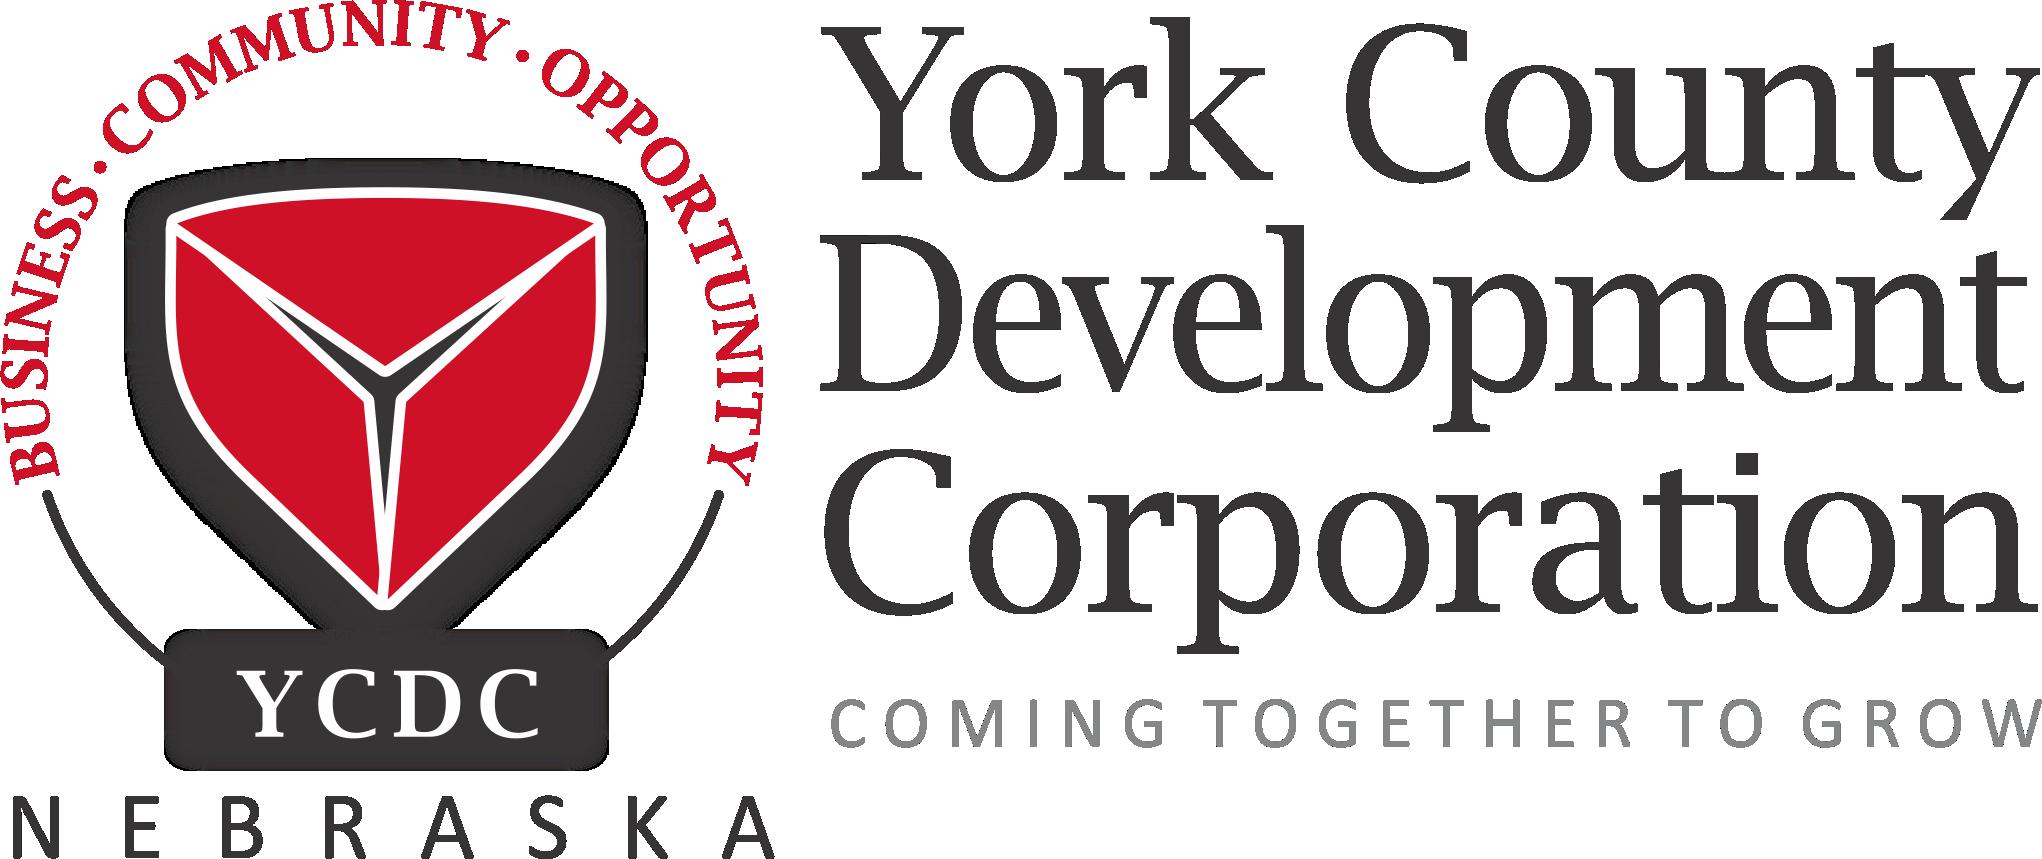 YORK COUNTY DEVELOPMENT CORPORATION HOSTS NATIONAL ECONOMIC DEVELOPMENT WEEK CELEBRATION - MAY 9-15, 2021 Main Photo